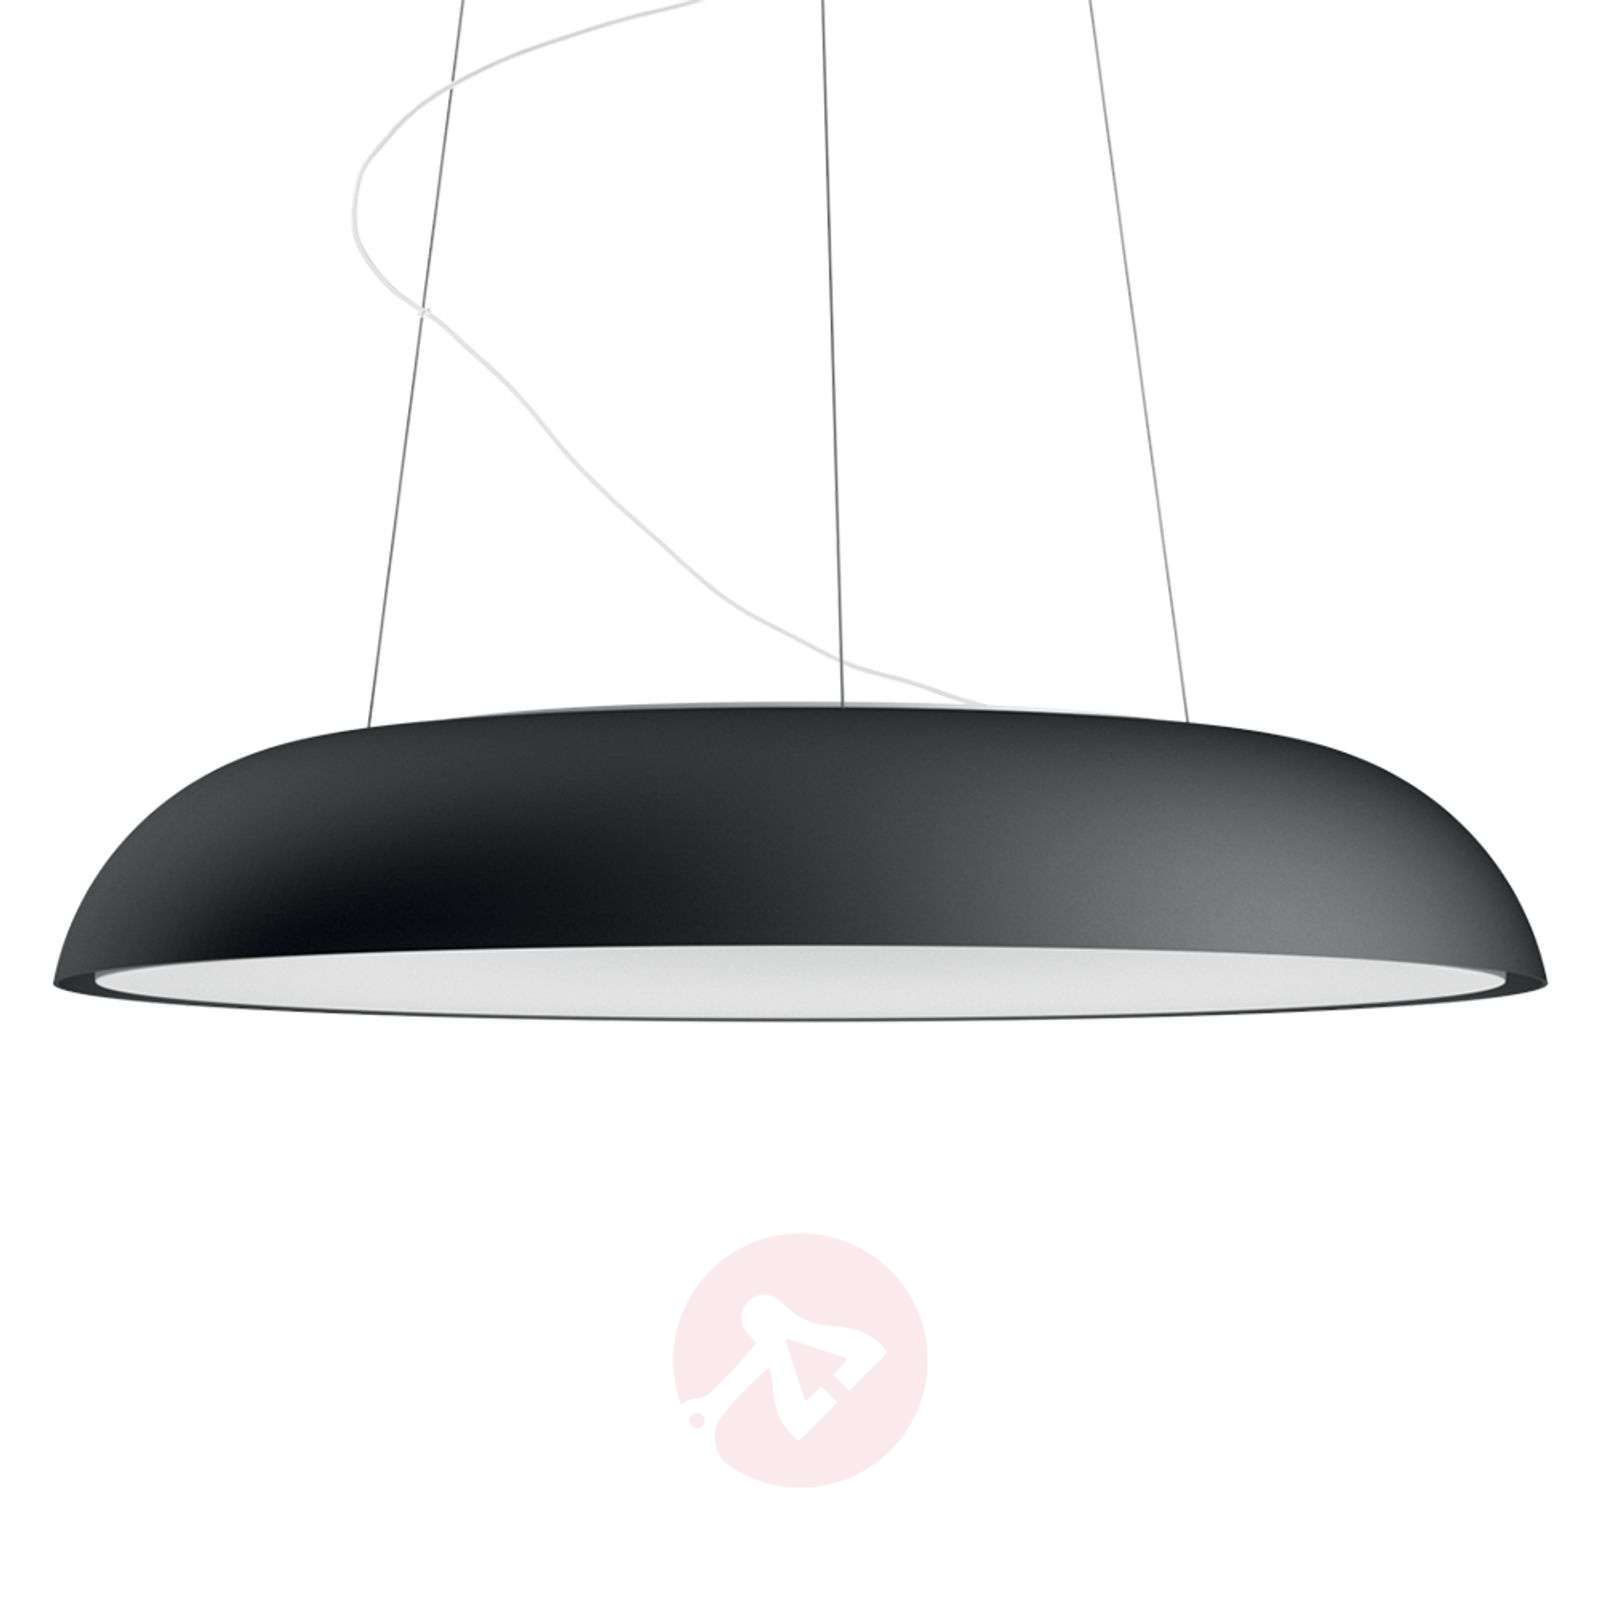 Philips Hue Led Hanging Light Amaze Dimmer Switch 7531872 01